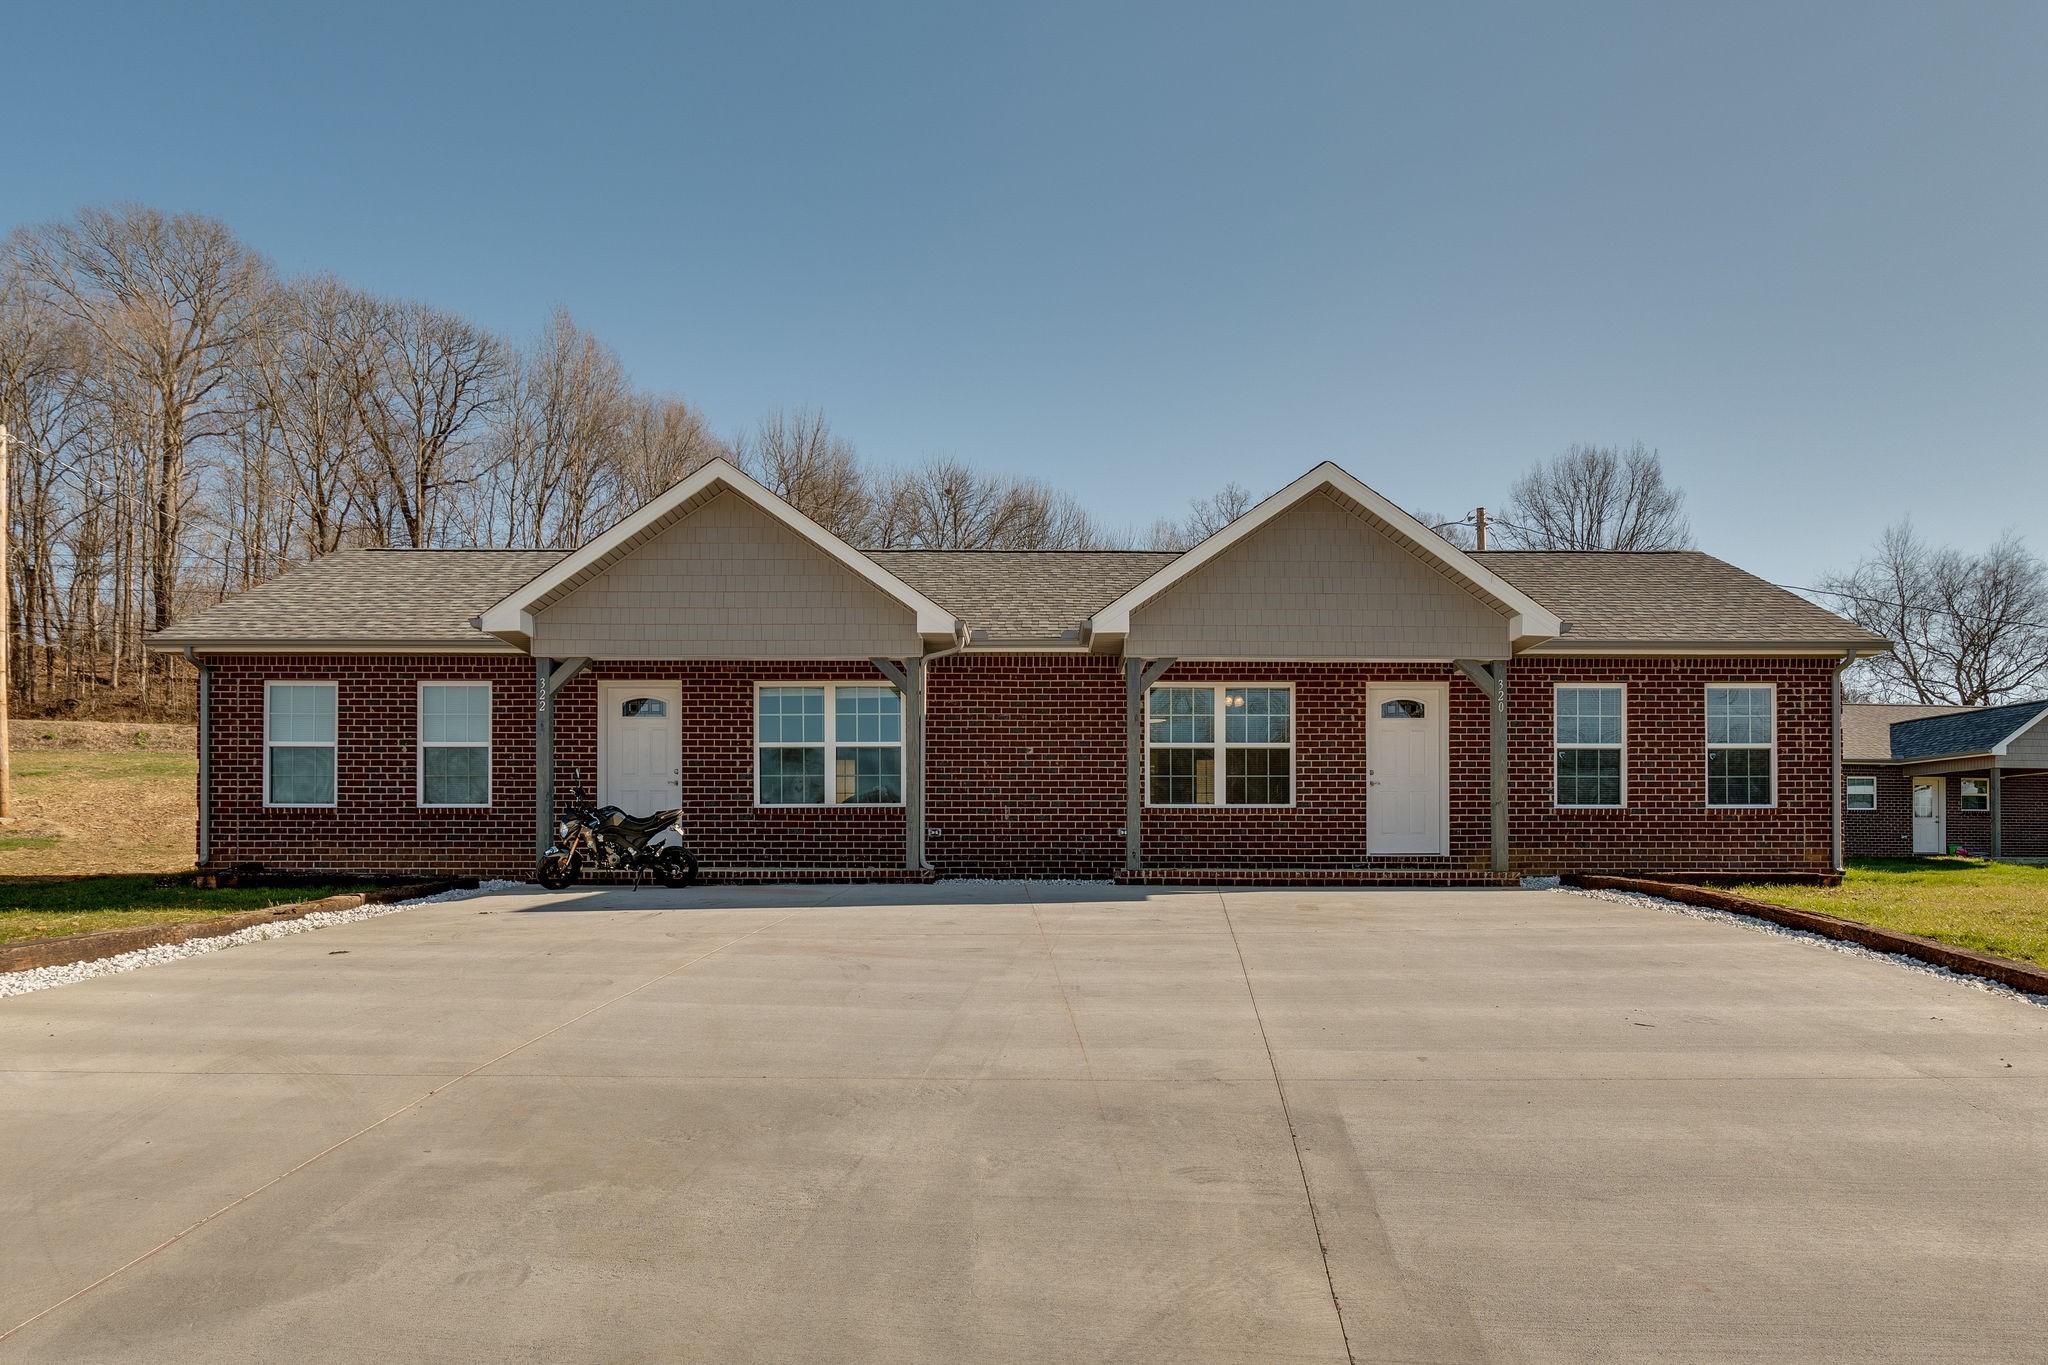 316 Blackman Blvd E Property Photo - Wartrace, TN real estate listing